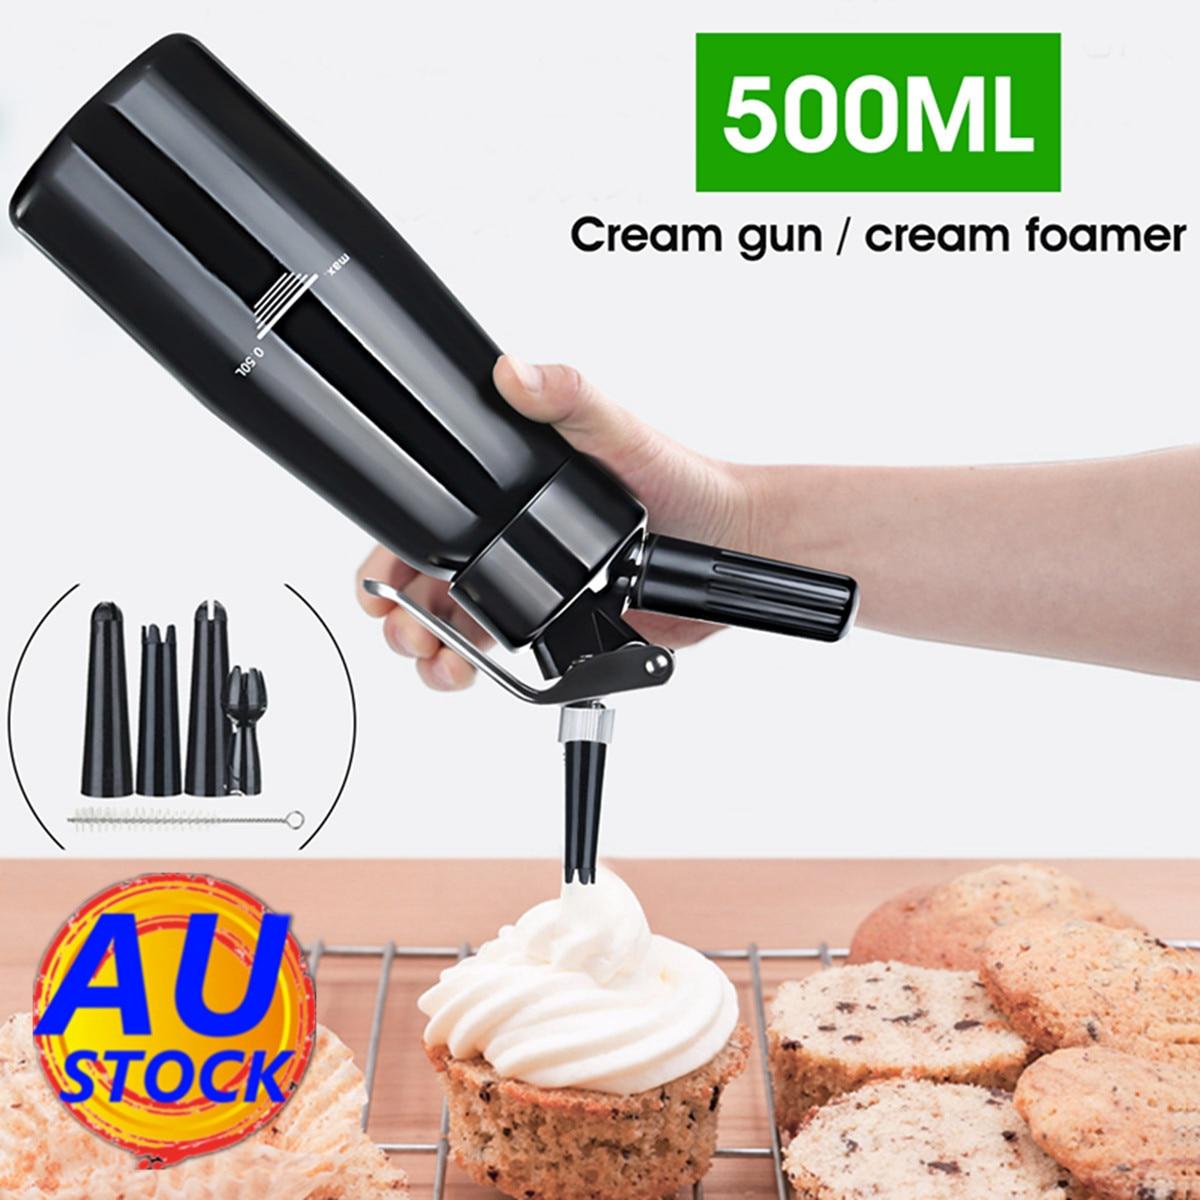 500ml Black Cream Butter Foam Whipper Coffee Dessert Cake Batter Dispenser Maker with Brush Nozzle Piping Mouth